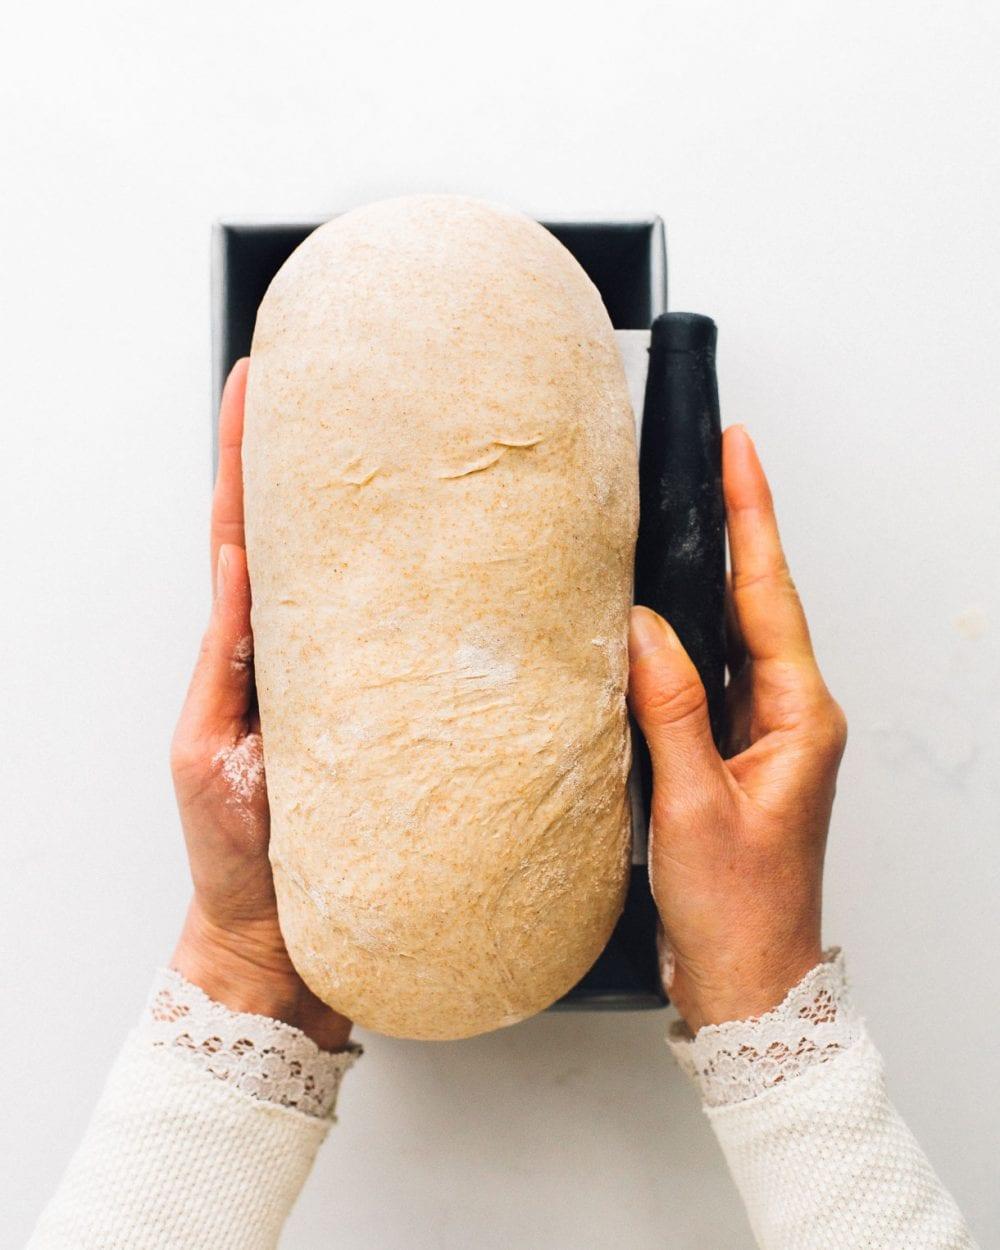 putting unbaked sourdough sandwich bread dough into pan